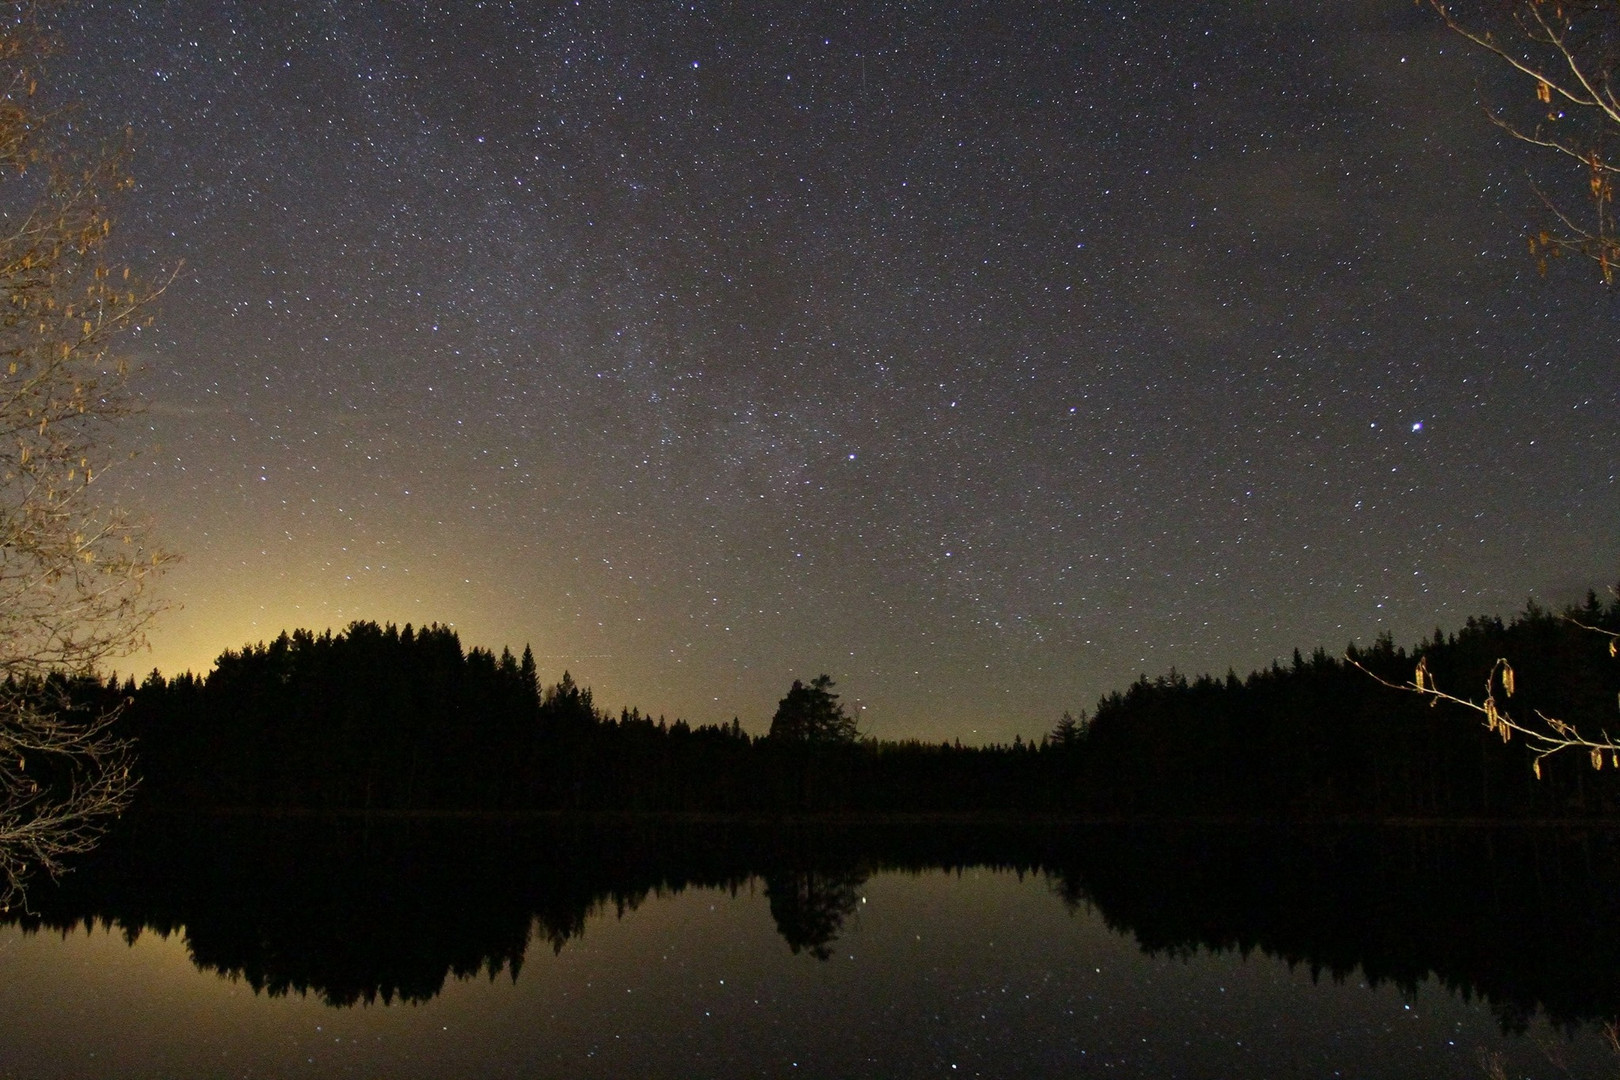 Sternenhimmel in Schwedens Norden